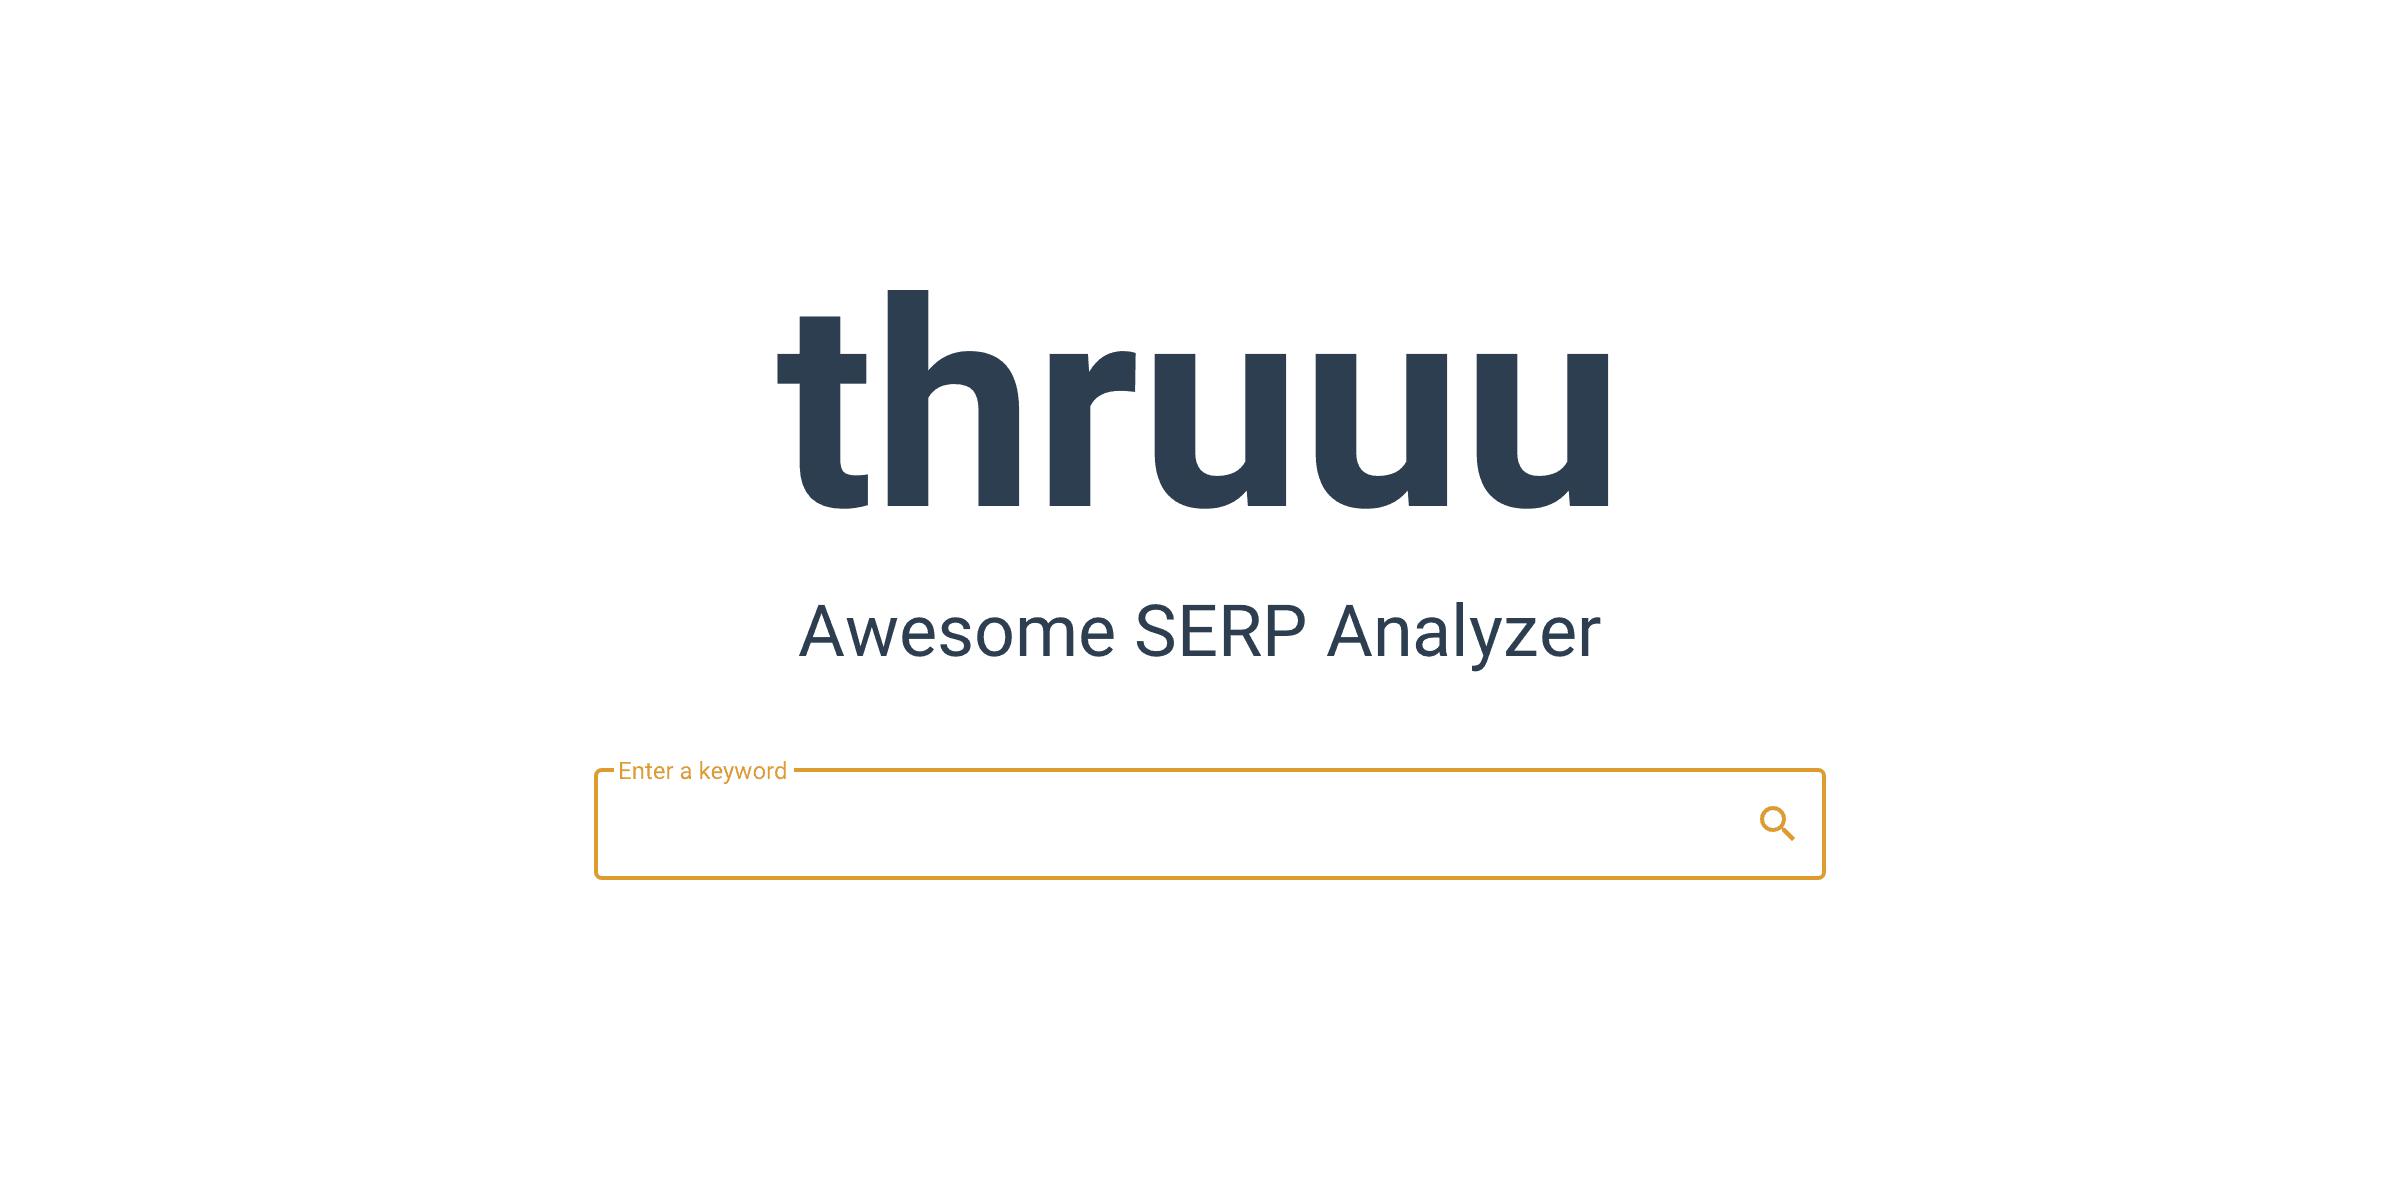 Thruuu, le SERP analyzer